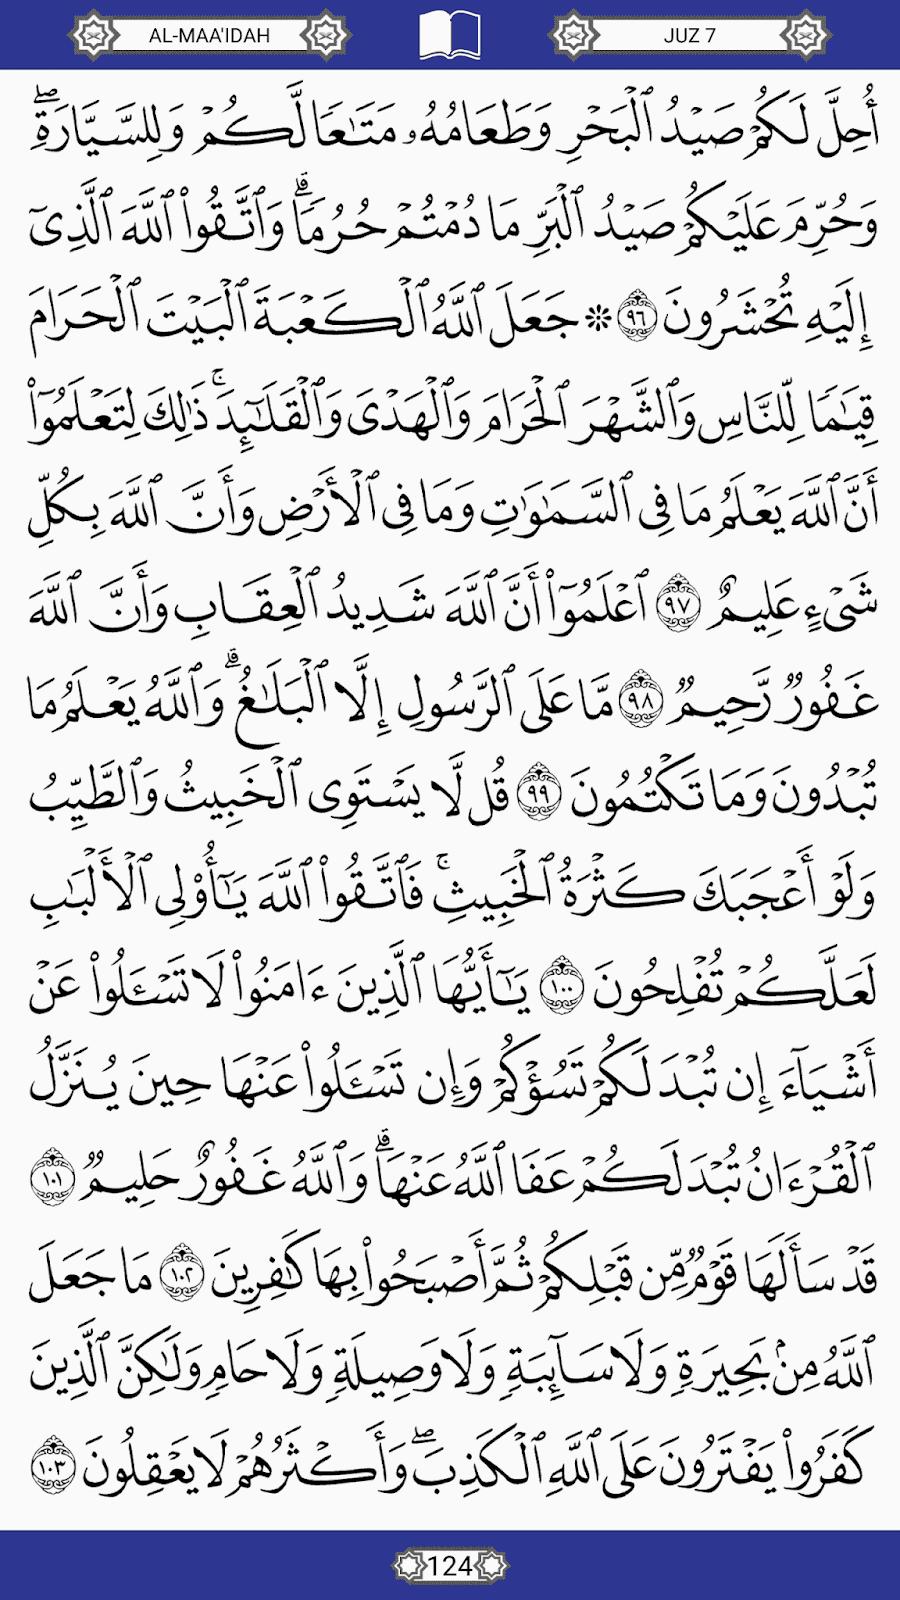 surah al maidah ayat 103